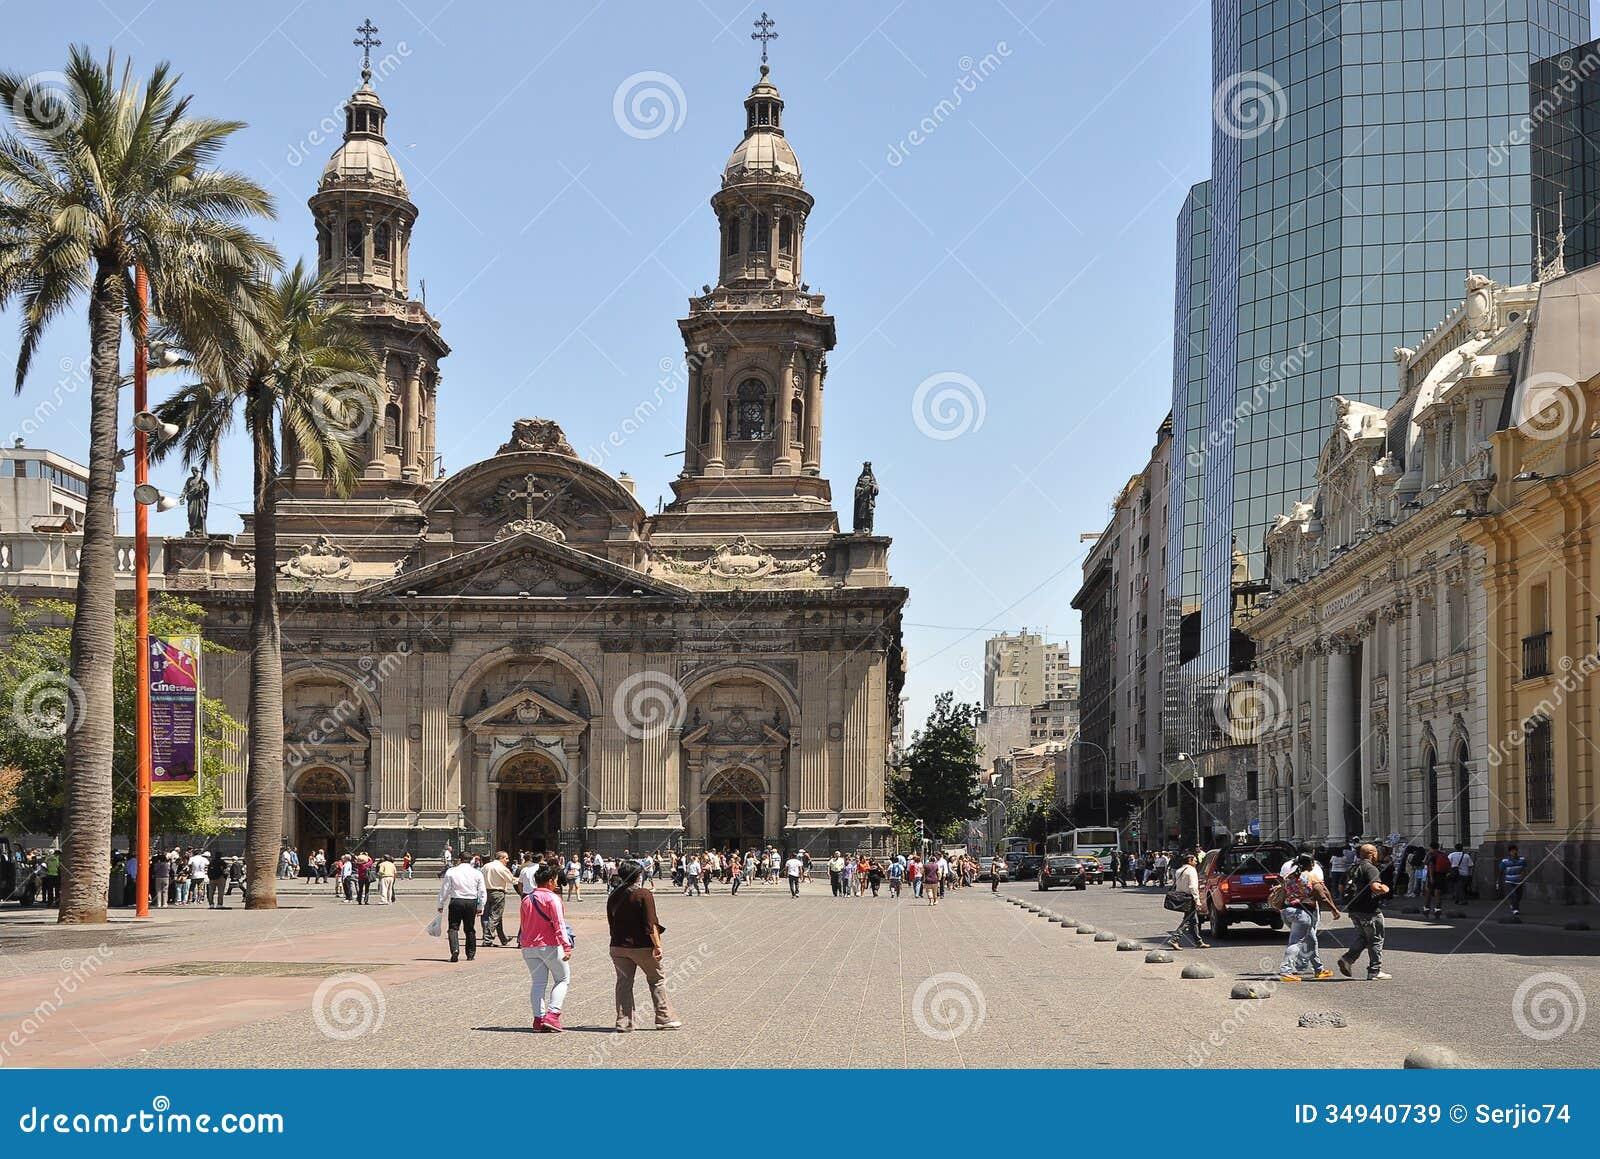 plaza de armas santiago de chile editorial stock image image of catolic building 34940739. Black Bedroom Furniture Sets. Home Design Ideas